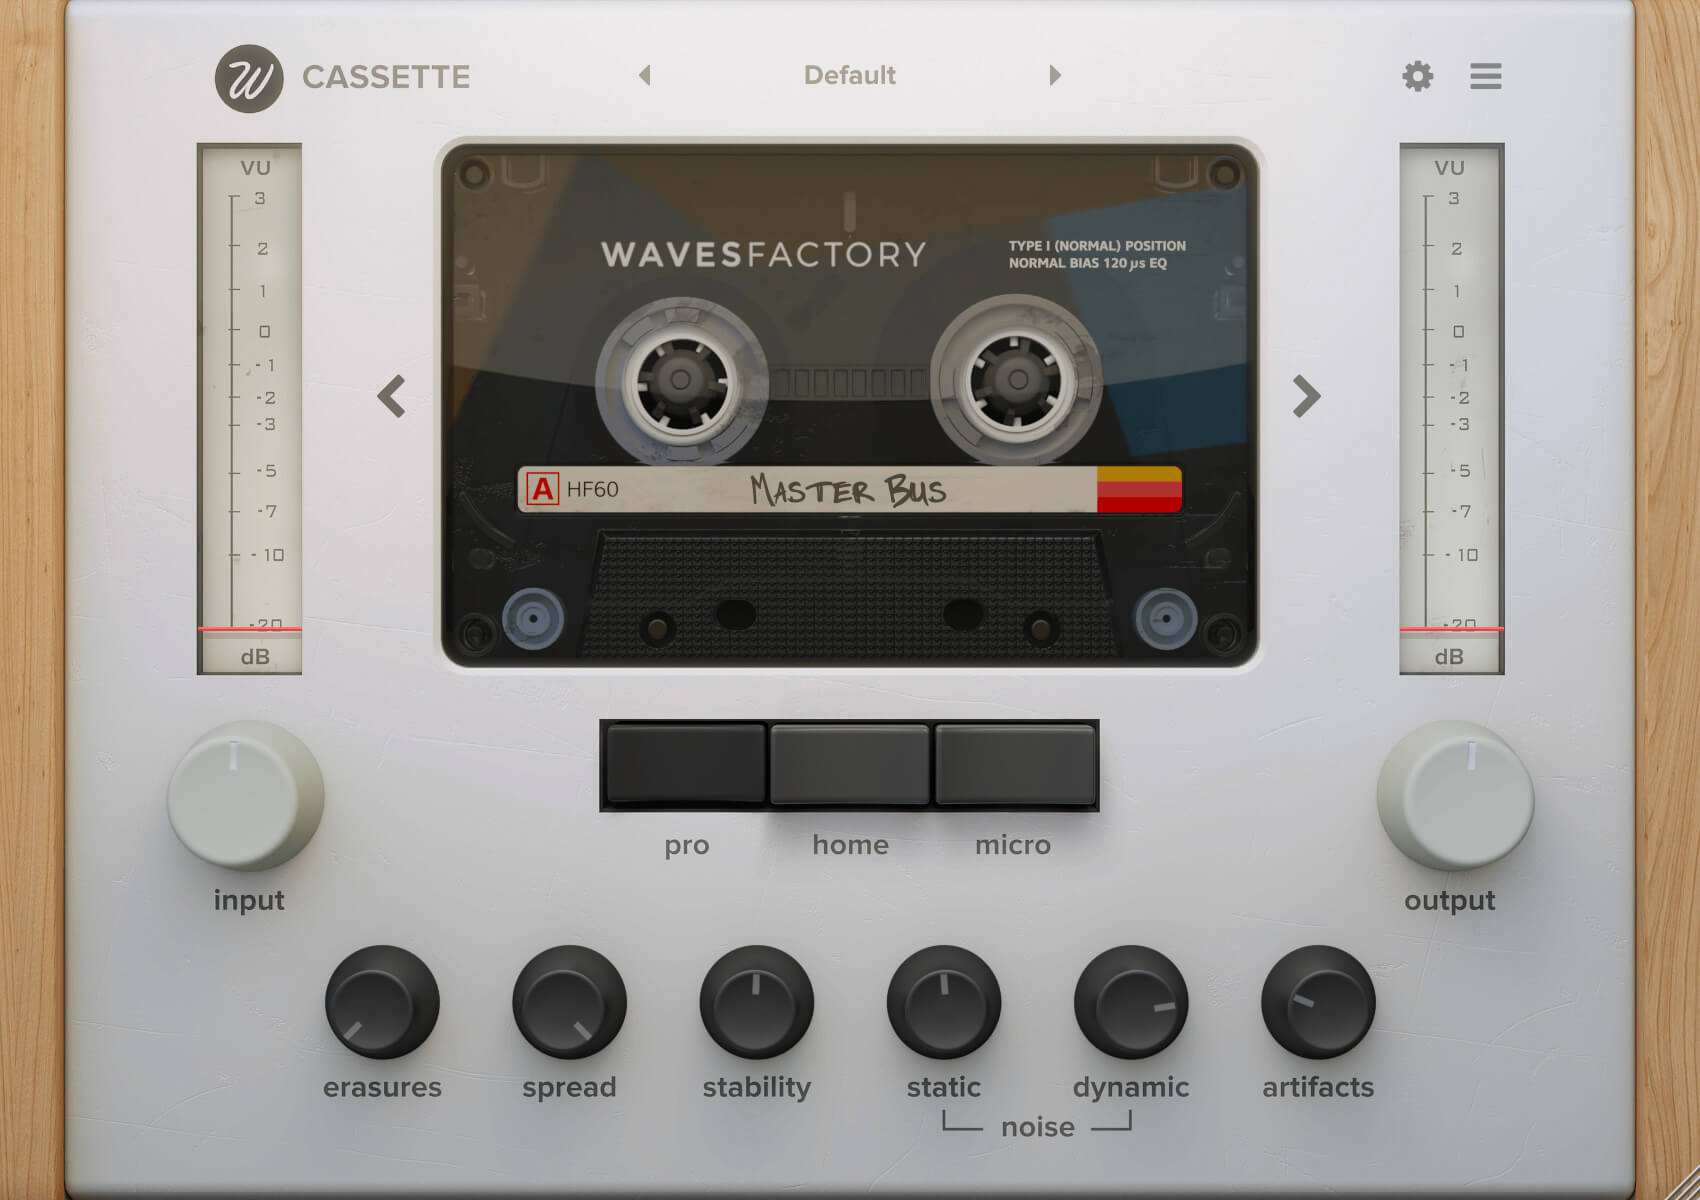 Wavesfactory – Cassette 1.0.4 VST, VST3, AAX x64 Crack